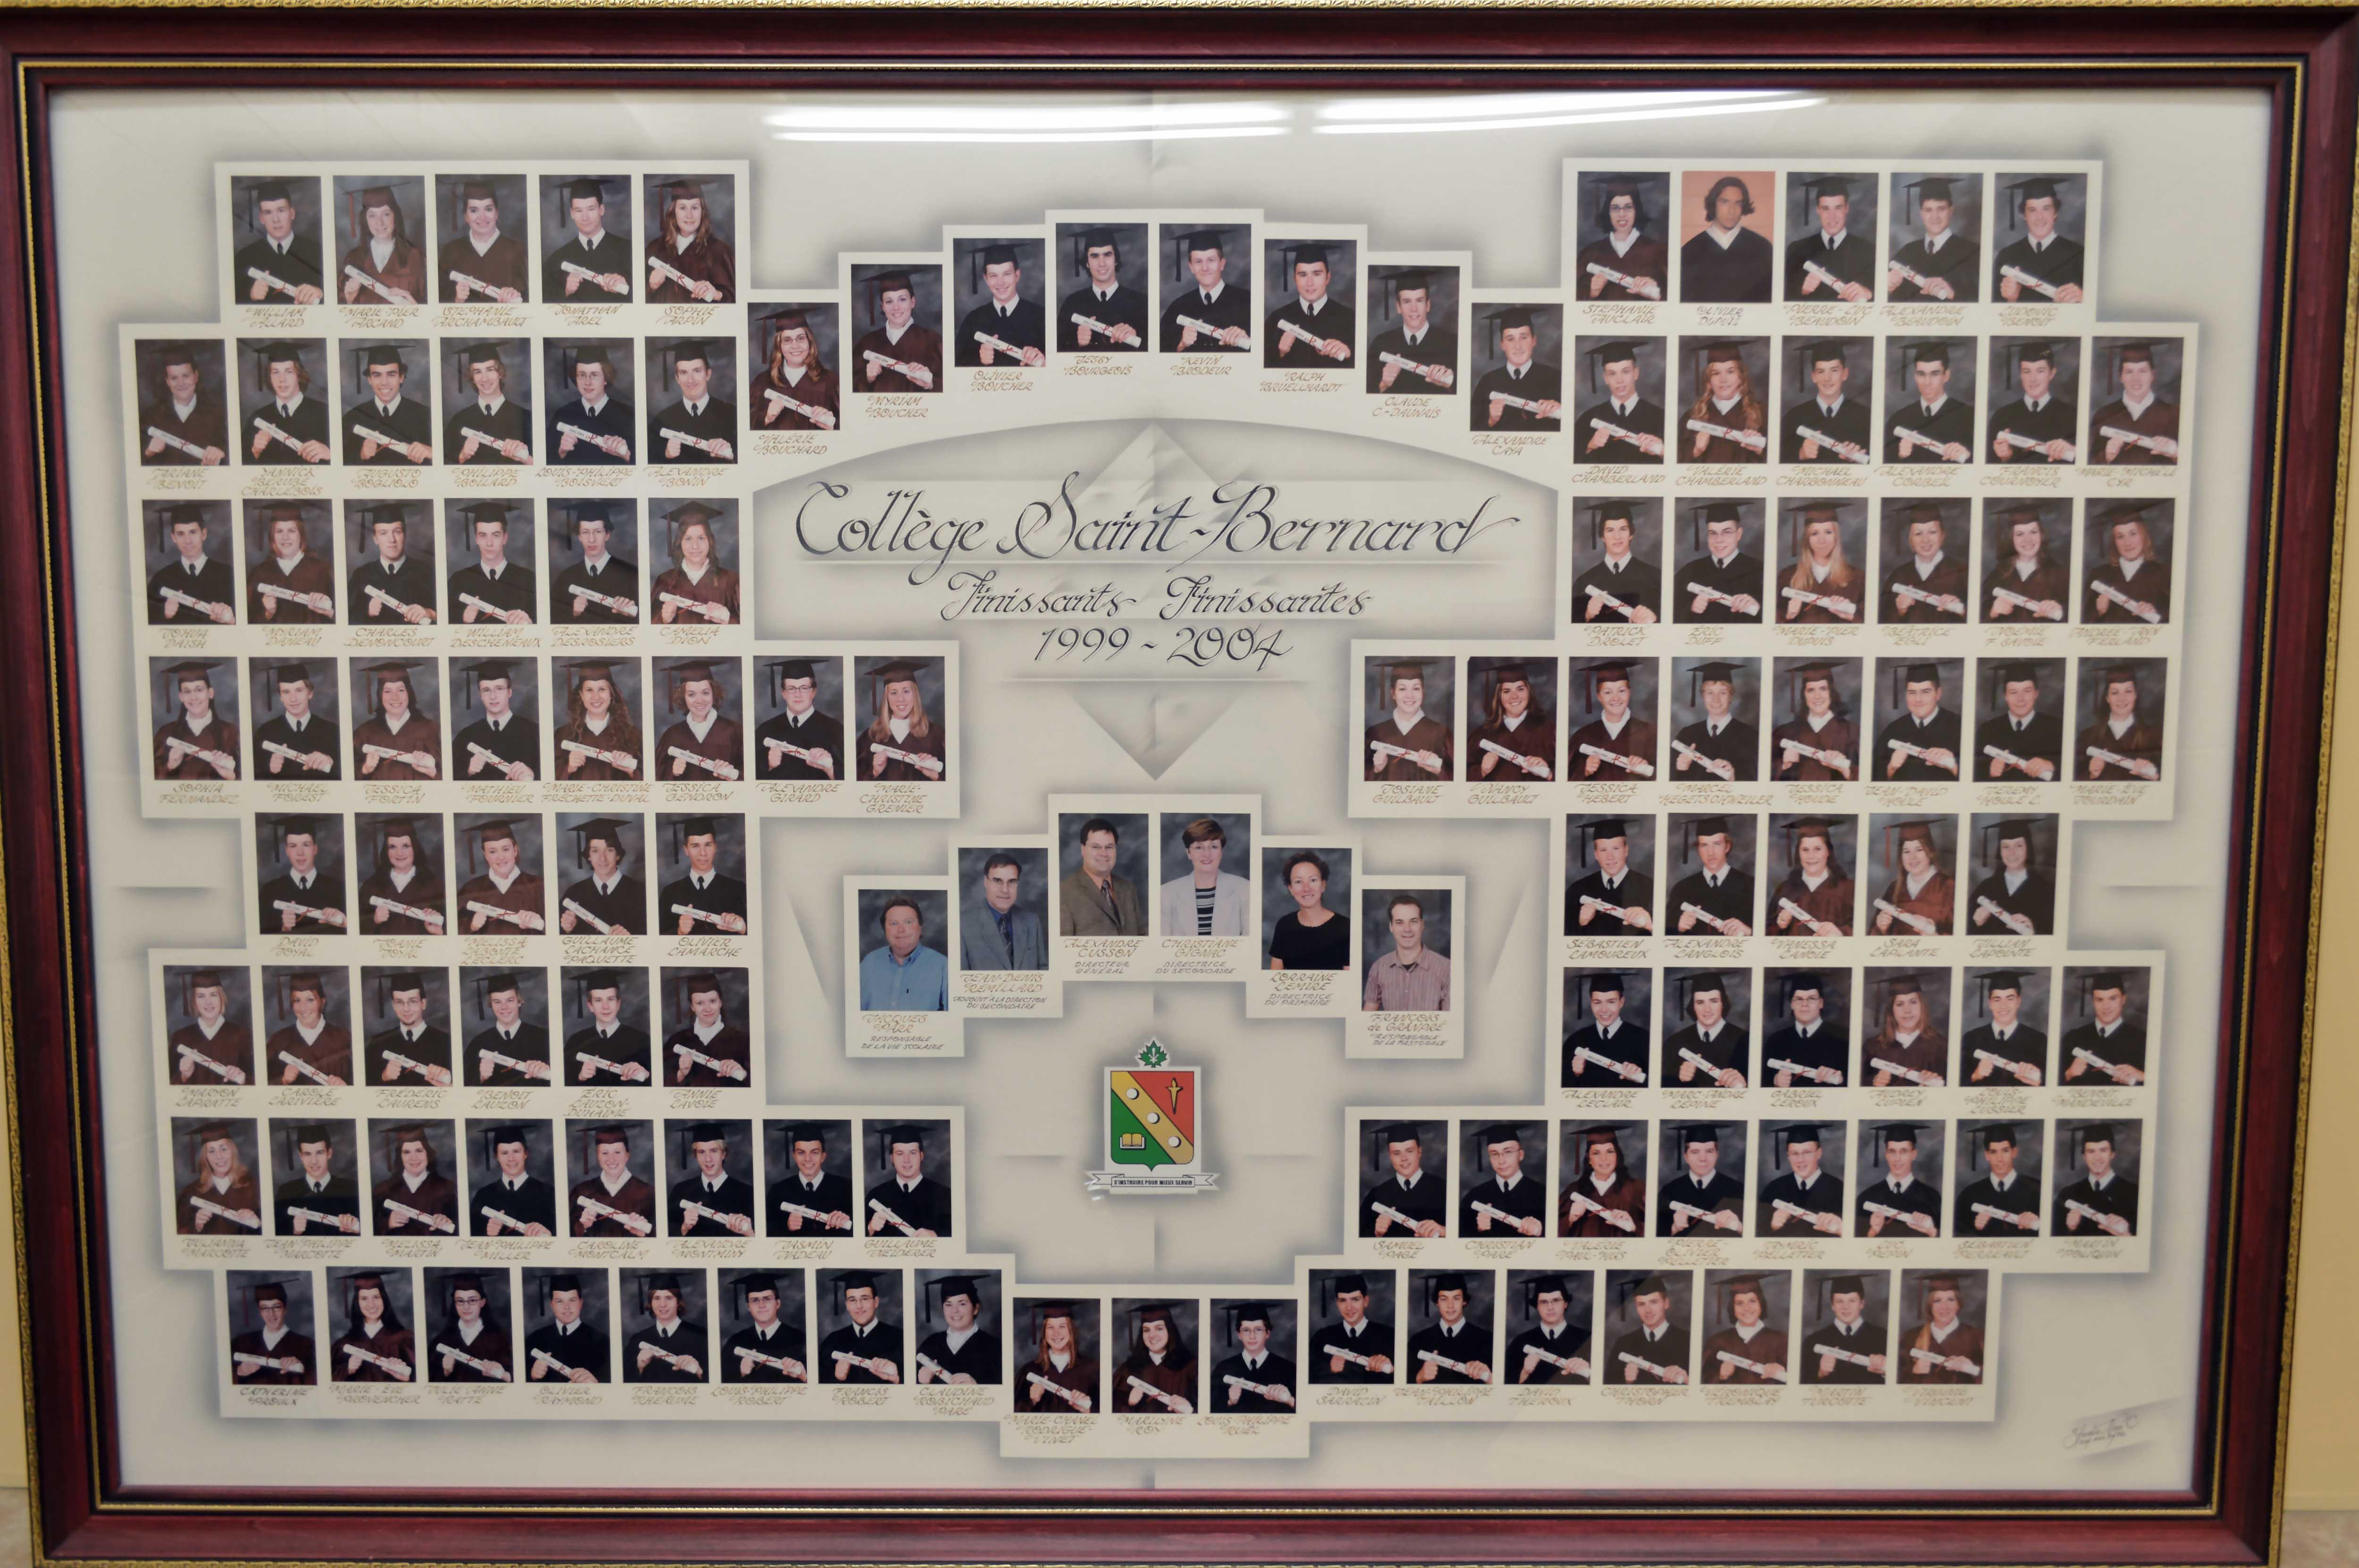 College-Saint-Bernard_Graduations-2003-04